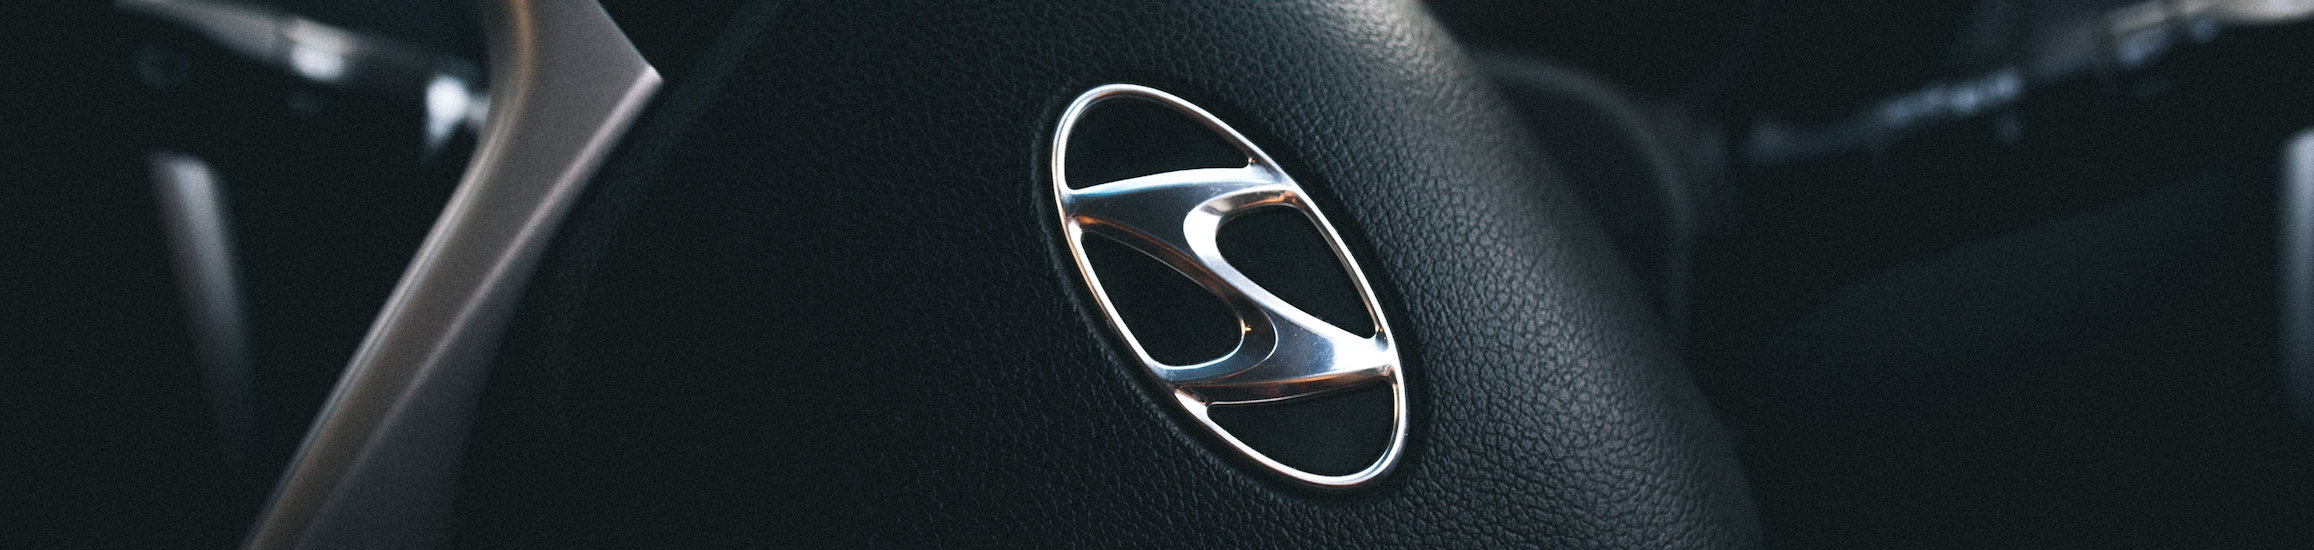 Why Buy A Hyundai